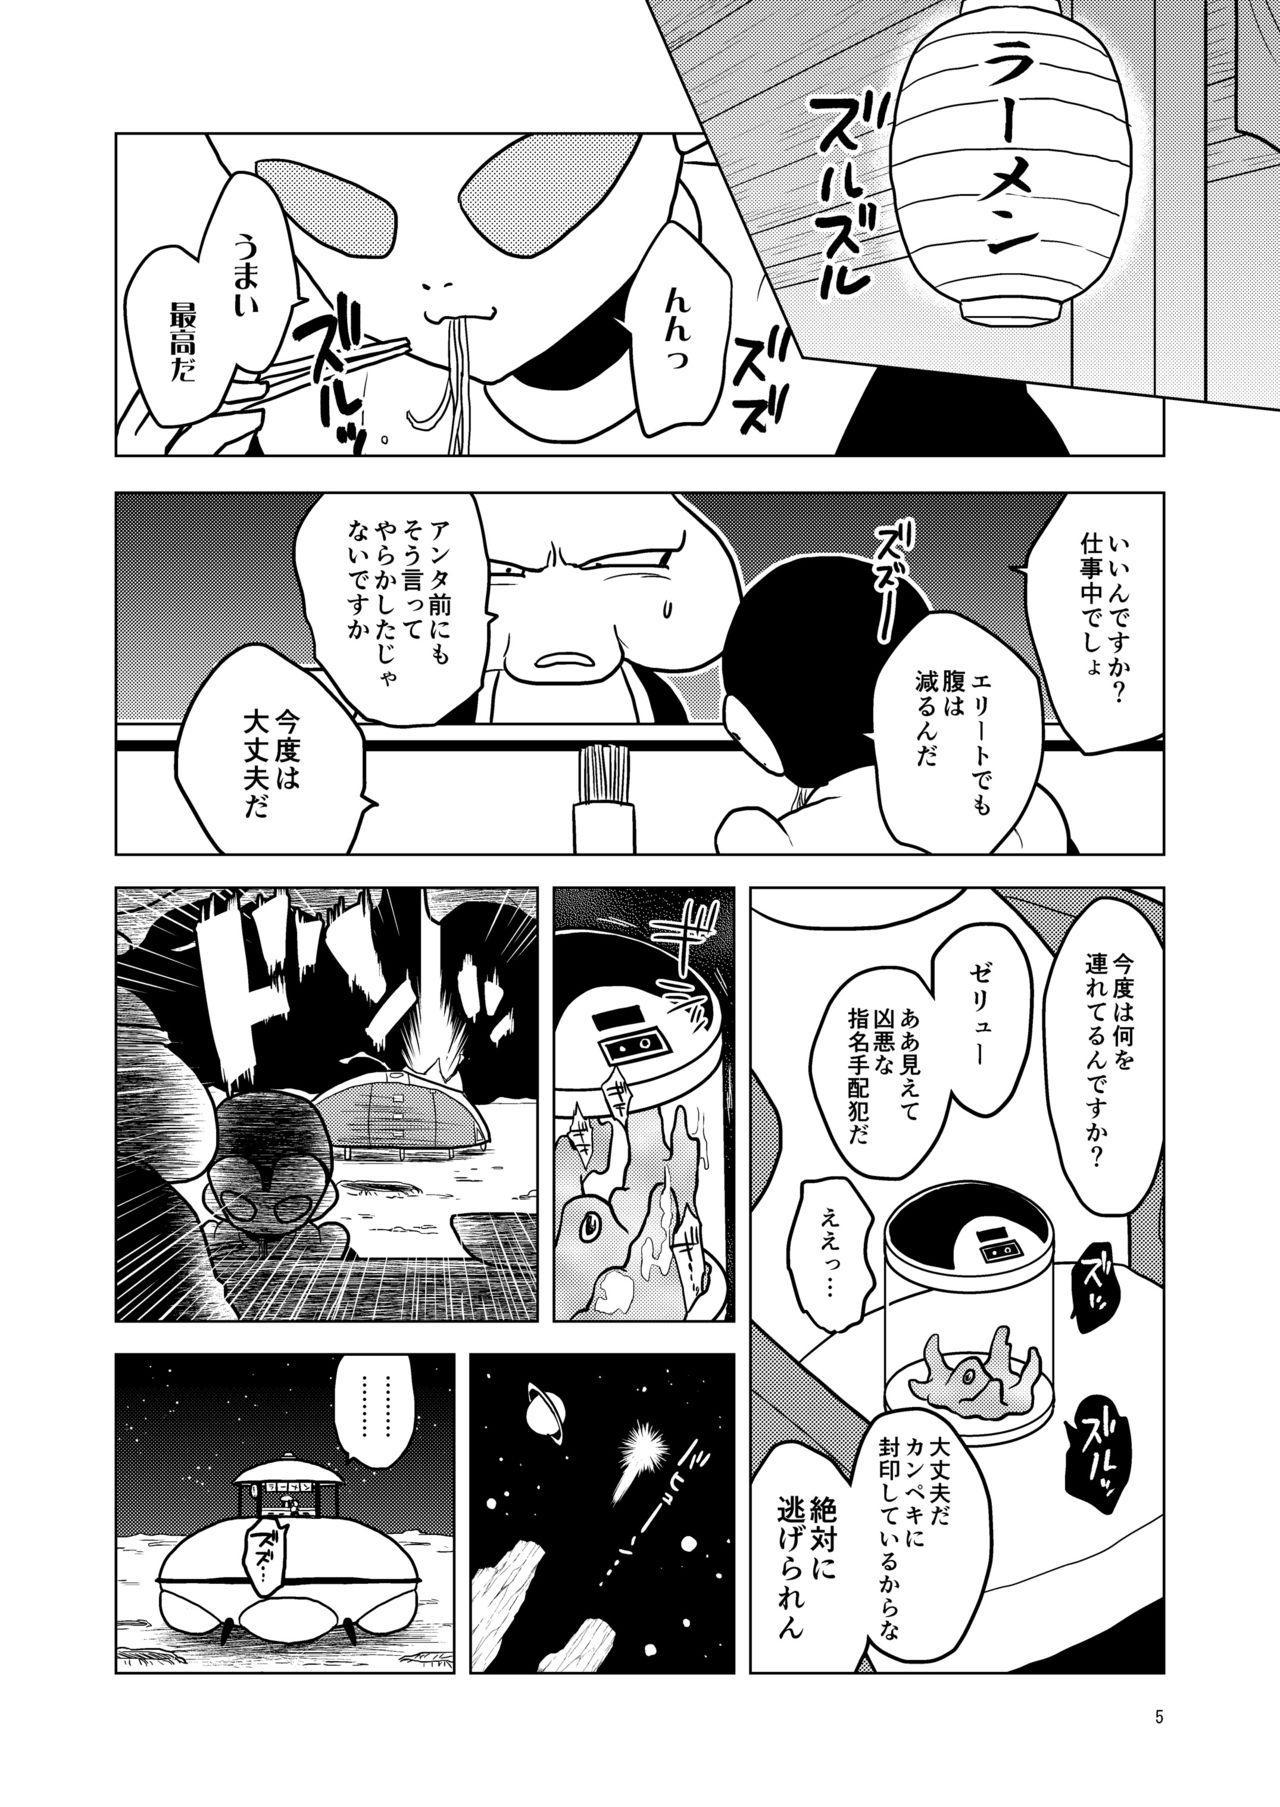 Great Saiyaman vs Shokushu Kaijin 4